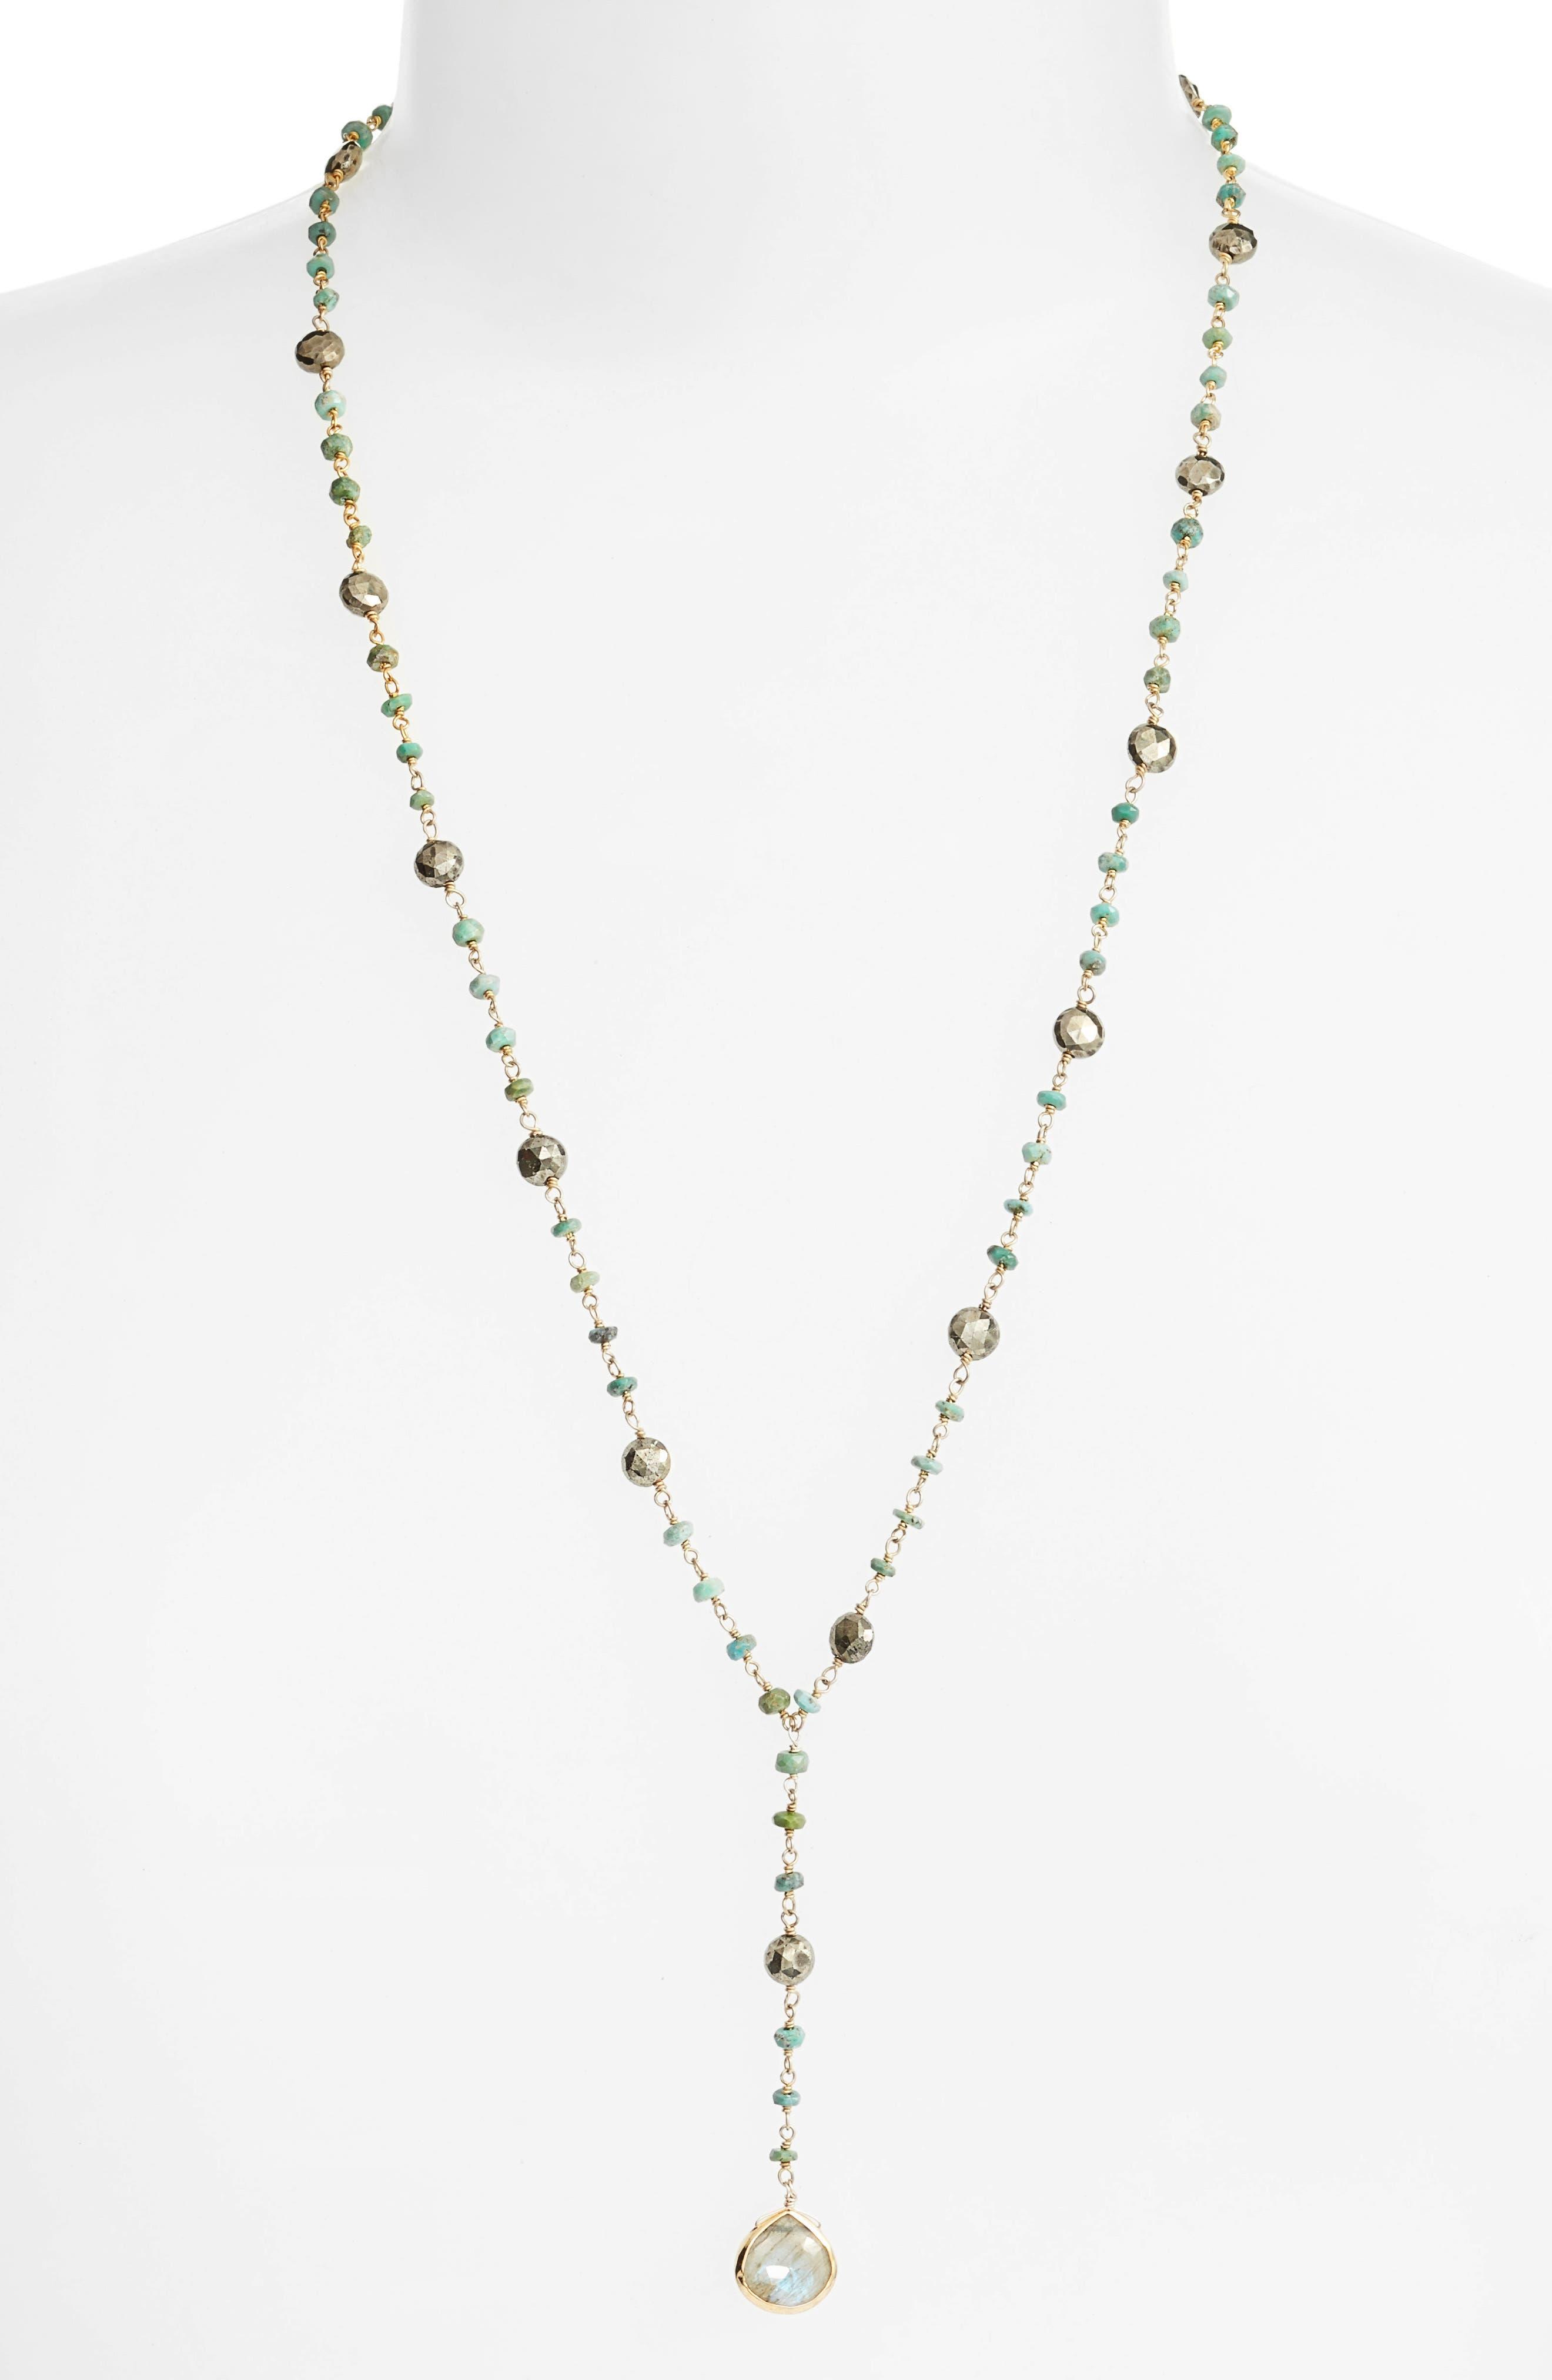 ela rae Yaeli Satellite 24 Semiprecious Stone Y-Necklace